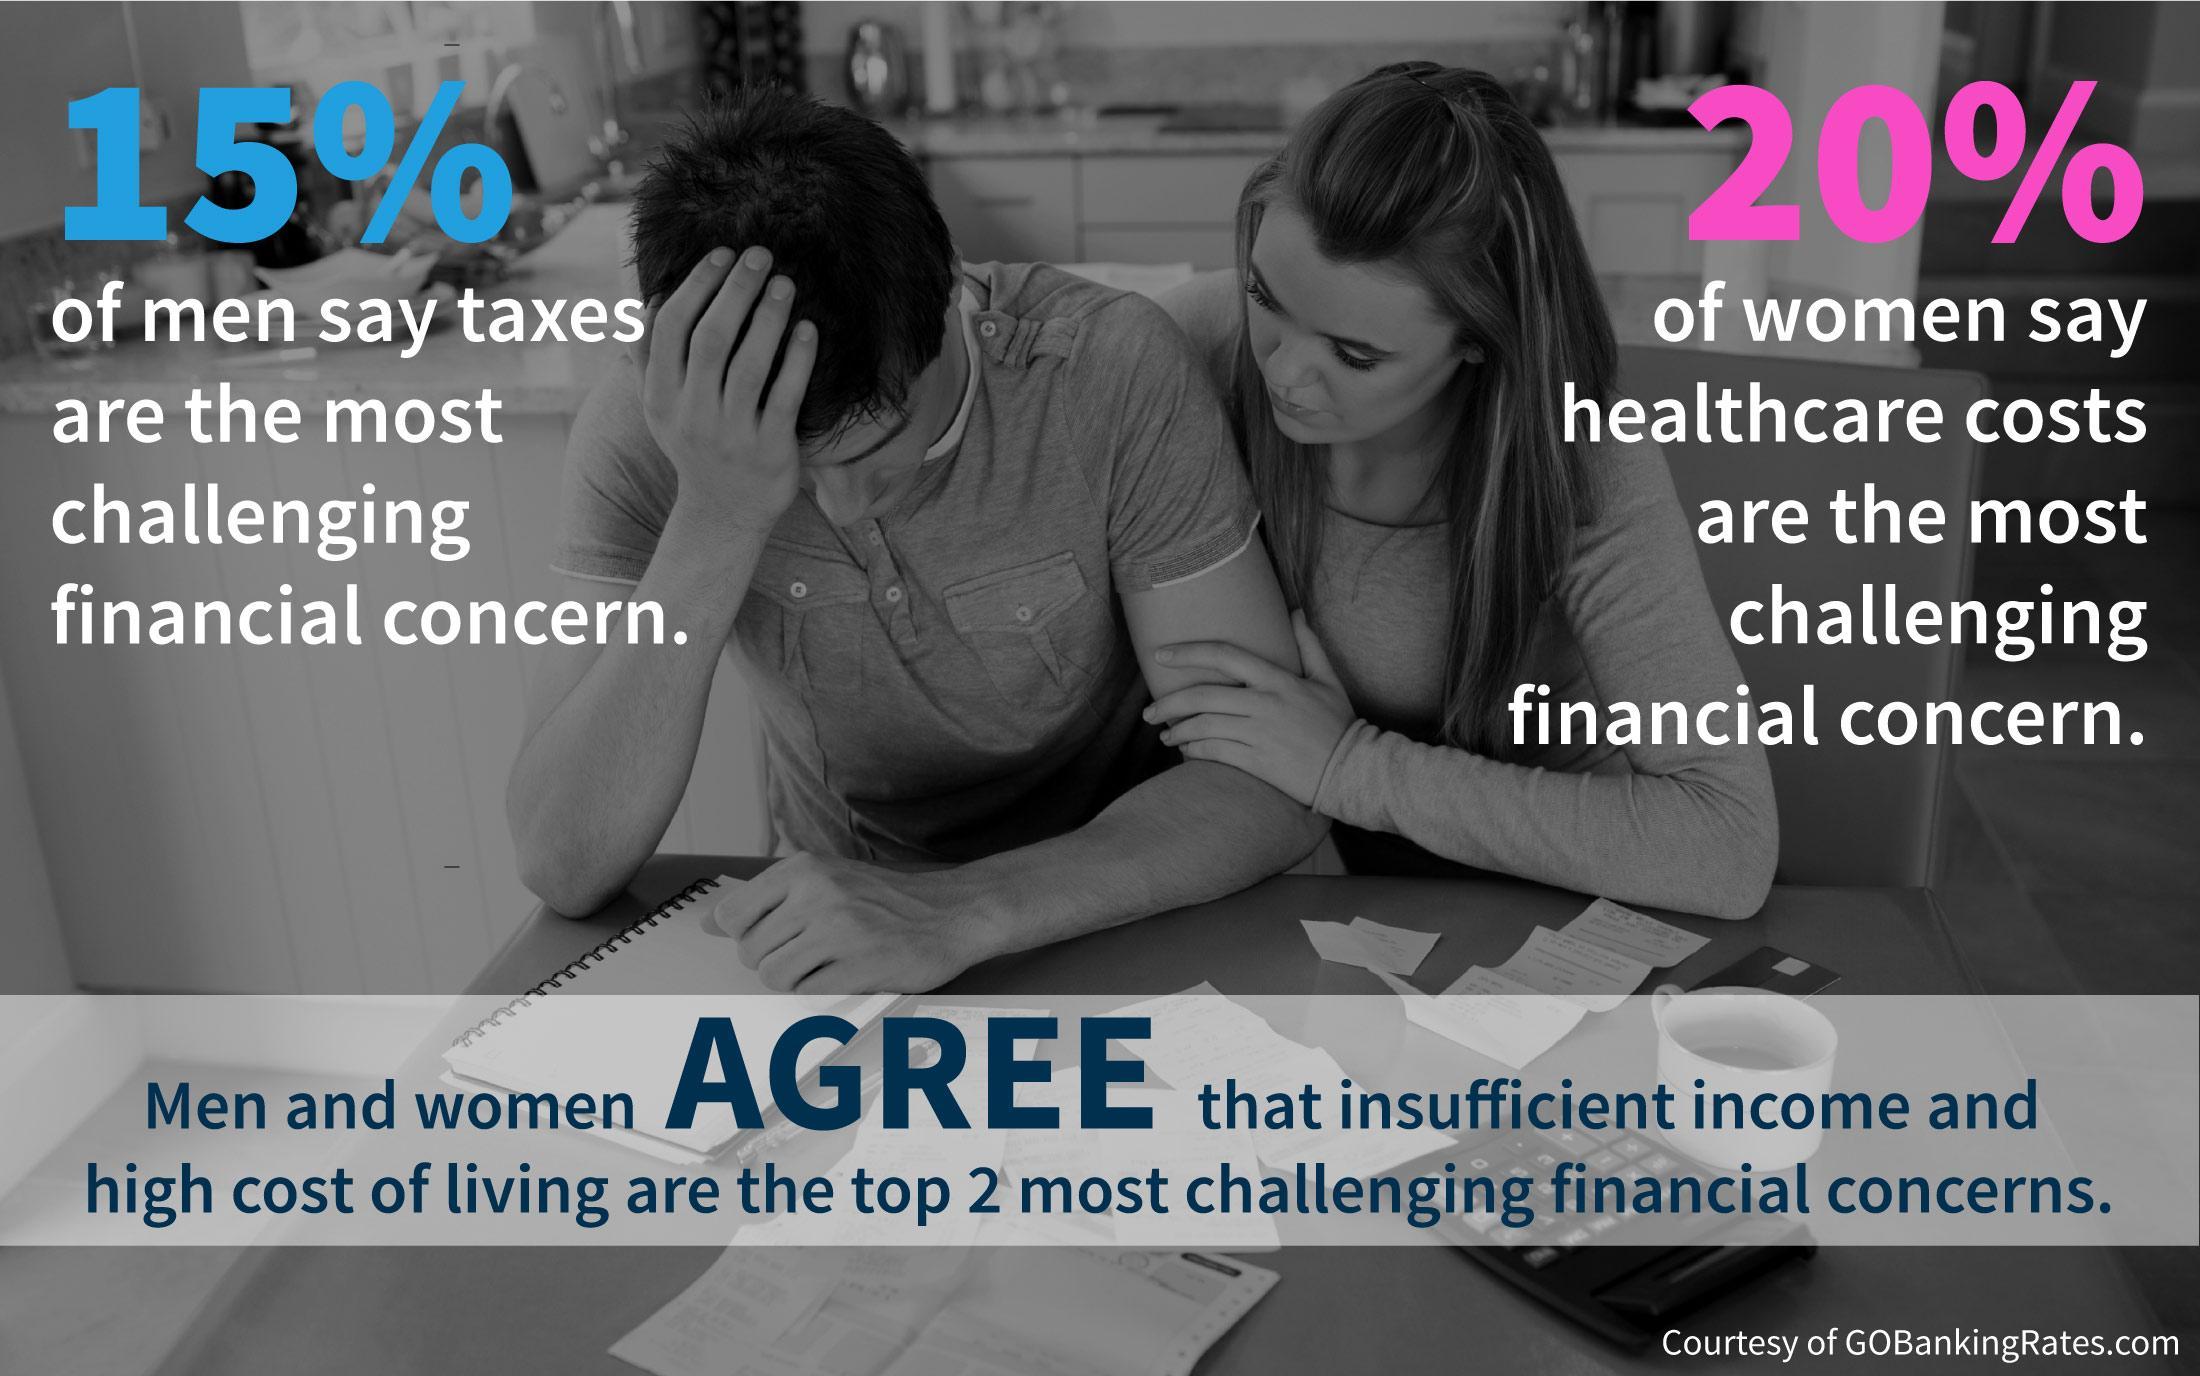 Americans' Biggest Financial Burdens Survey Results by Gender